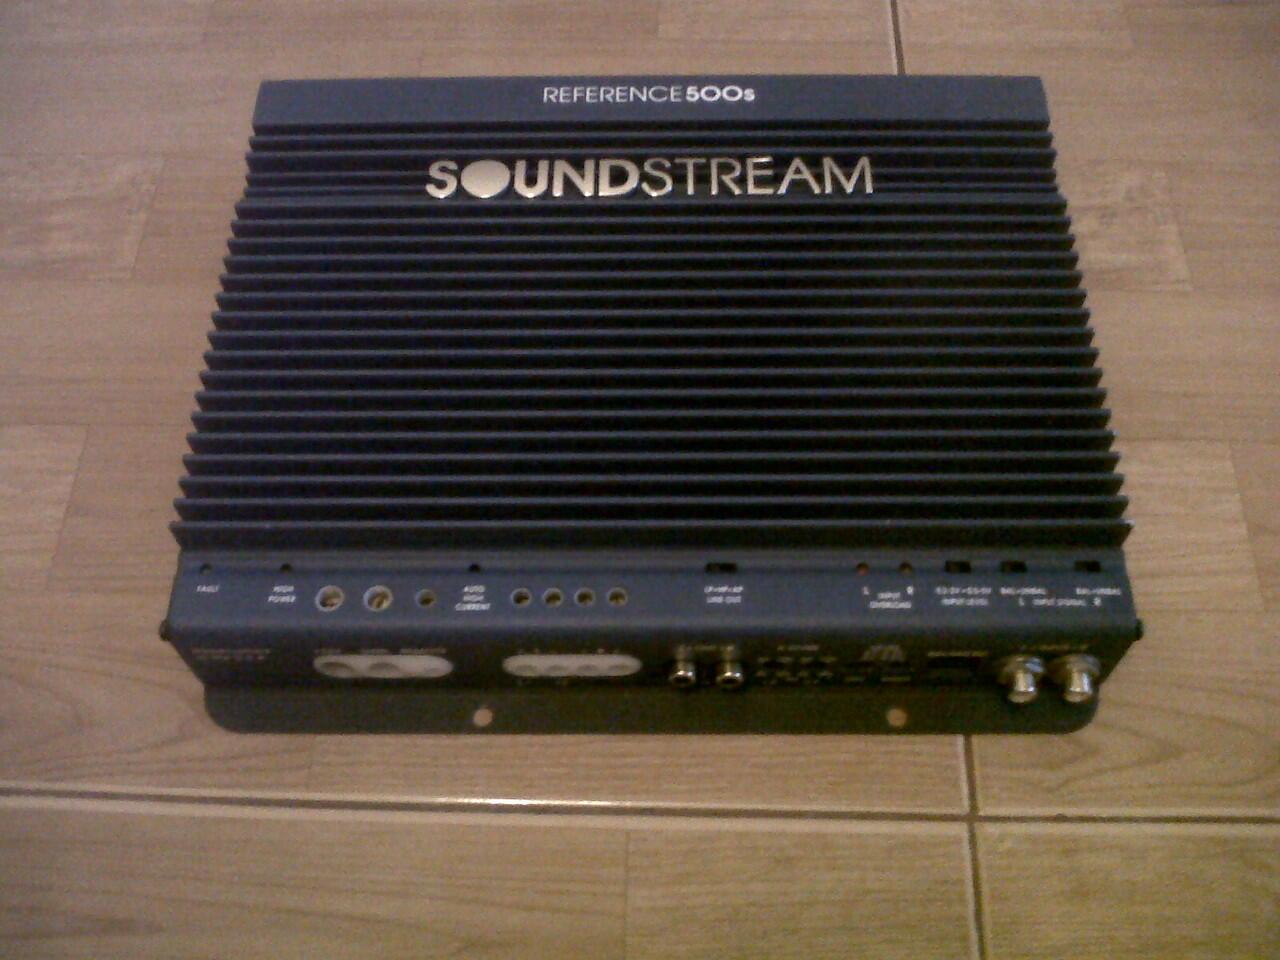 power SOUNDSTREM REF 500s, 2ch